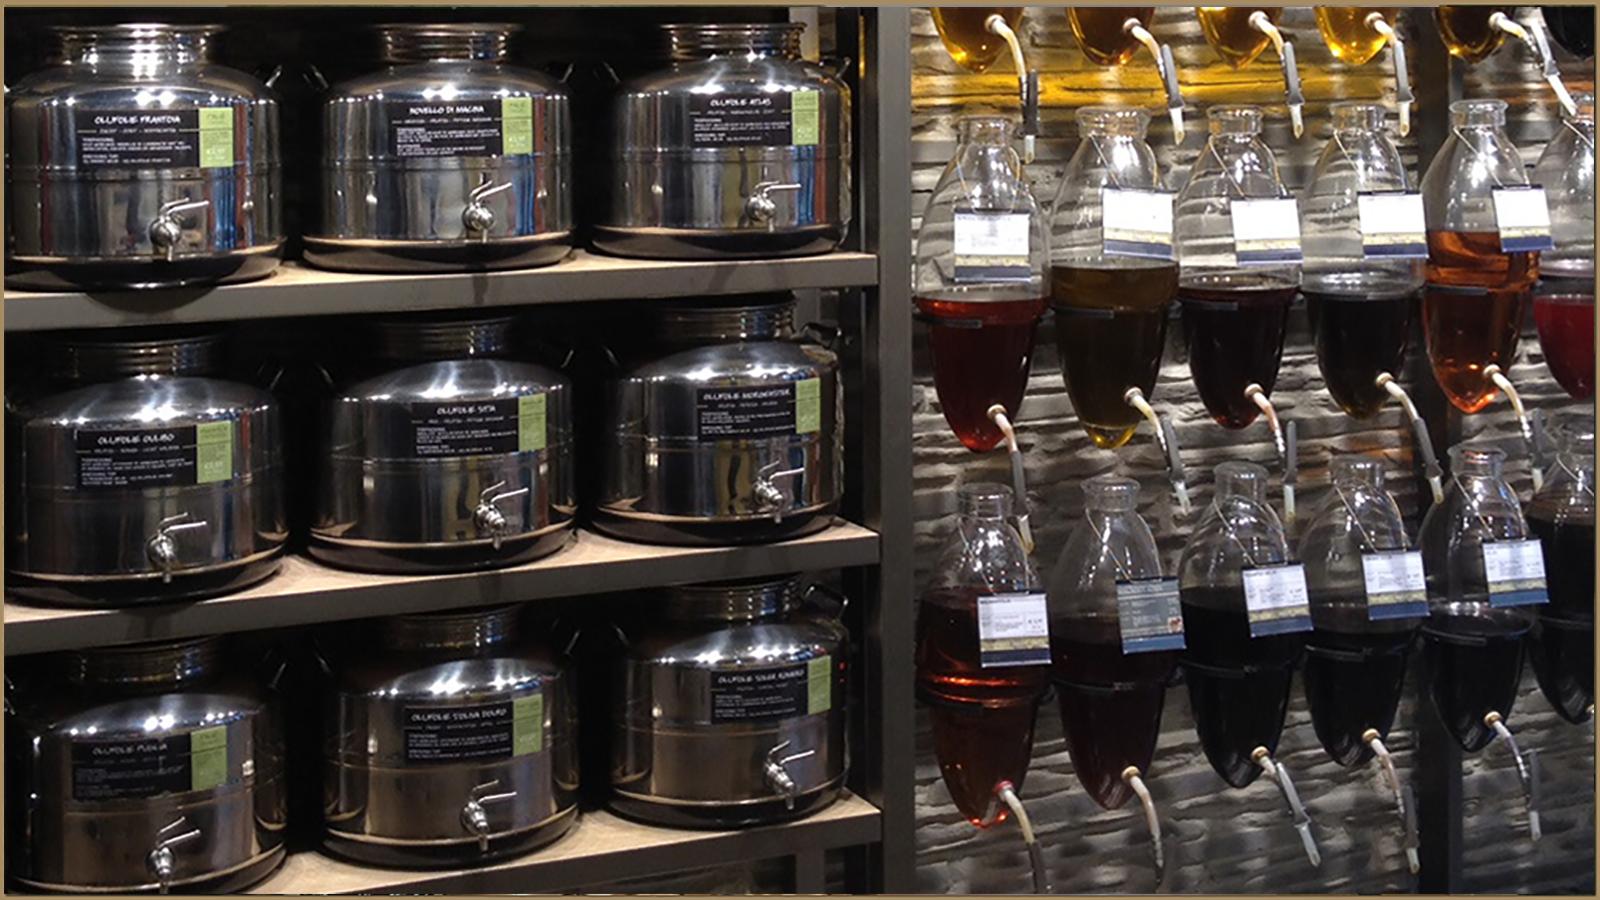 Oil & Vinegar Store Interior